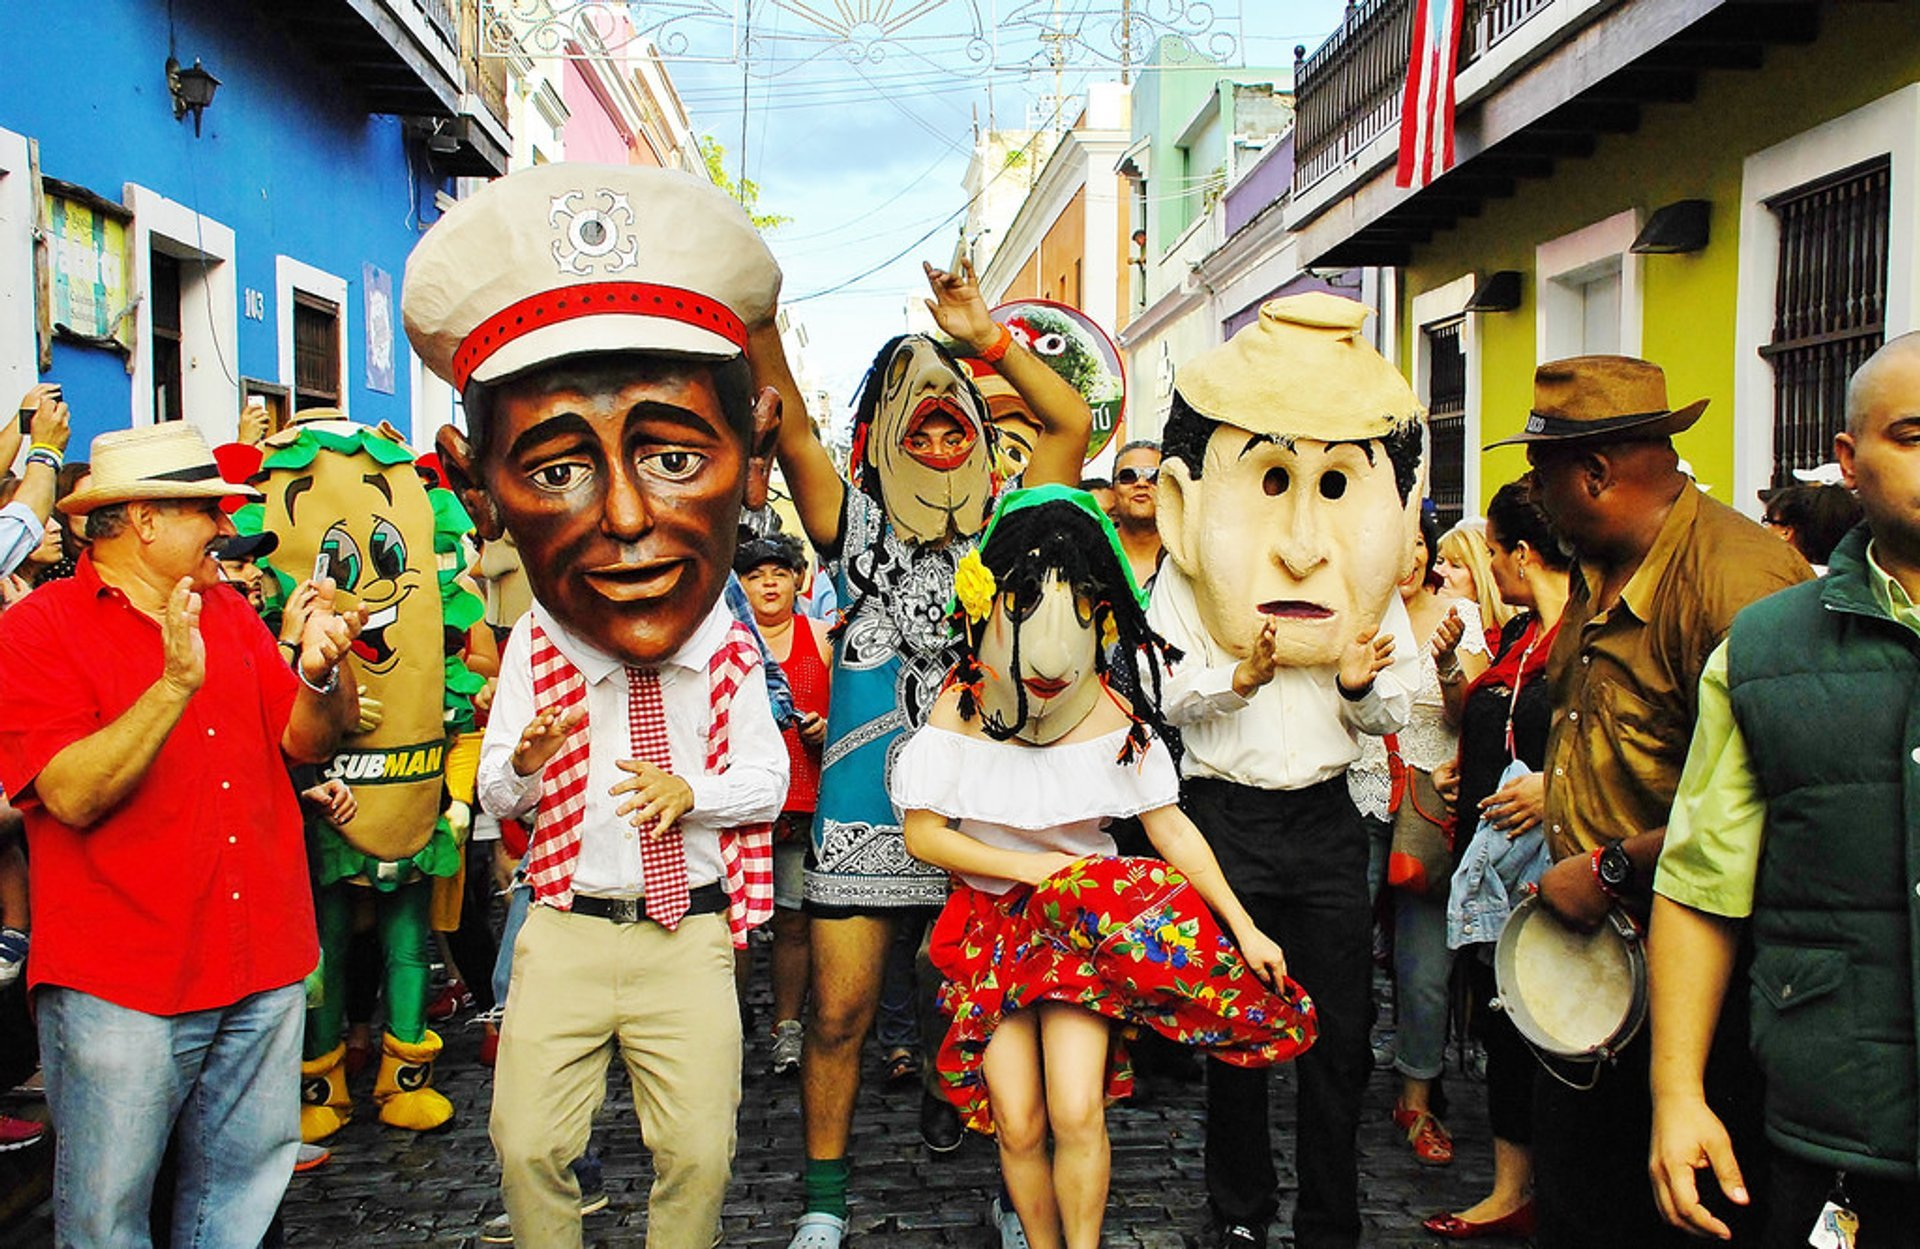 San Sebastian Street Festival 2020 In Puerto Rico Dates Map